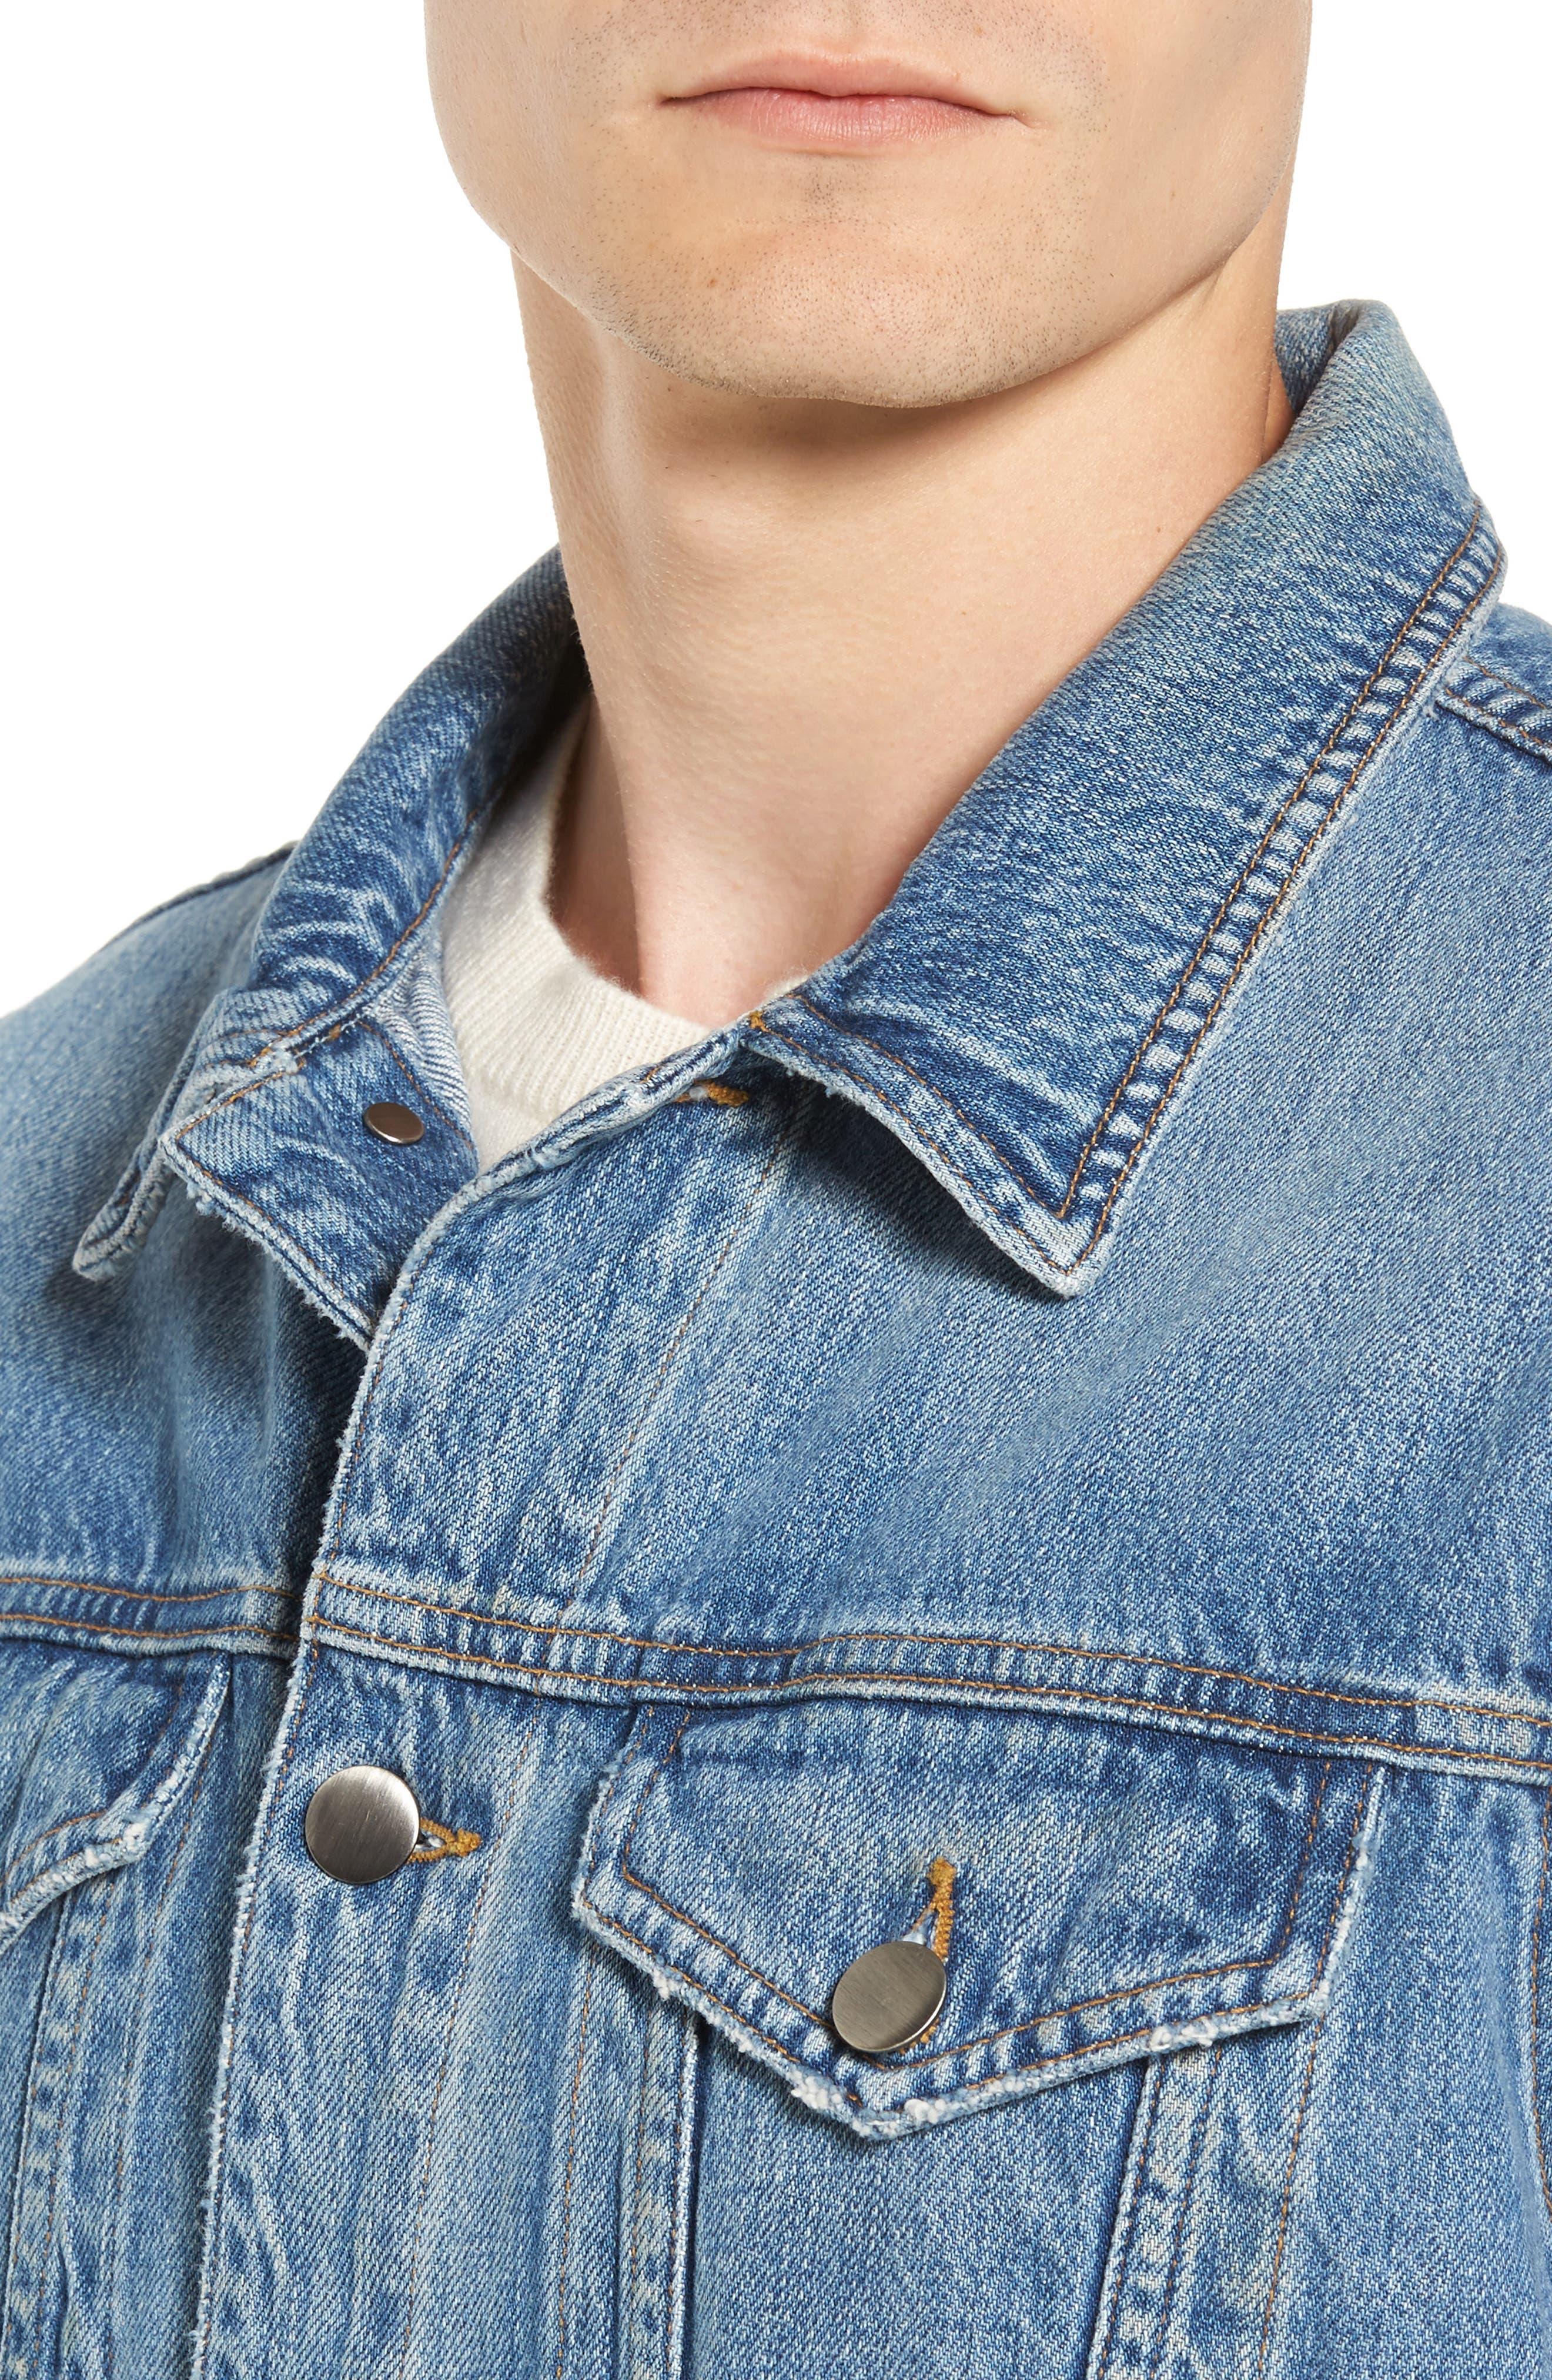 L'Homme Denim Jacket,                             Alternate thumbnail 4, color,                             450